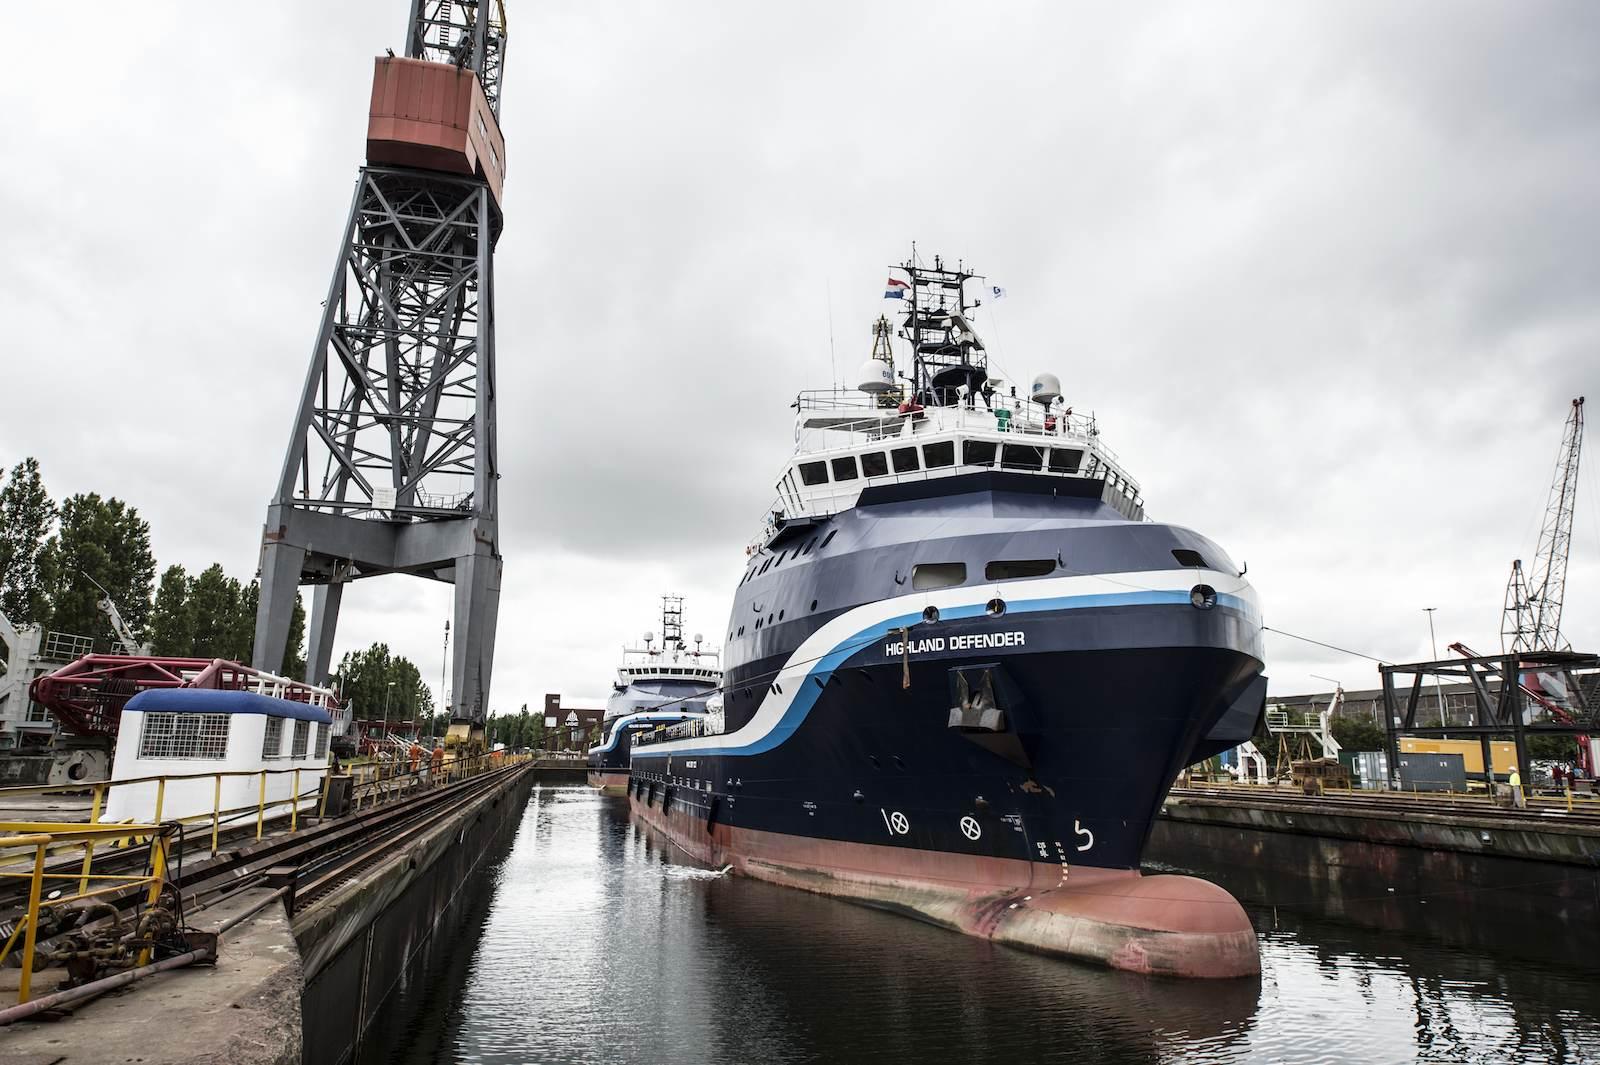 High-speed Shipdock antiroll retrofit onto GulfMark Platform Supply Vessels